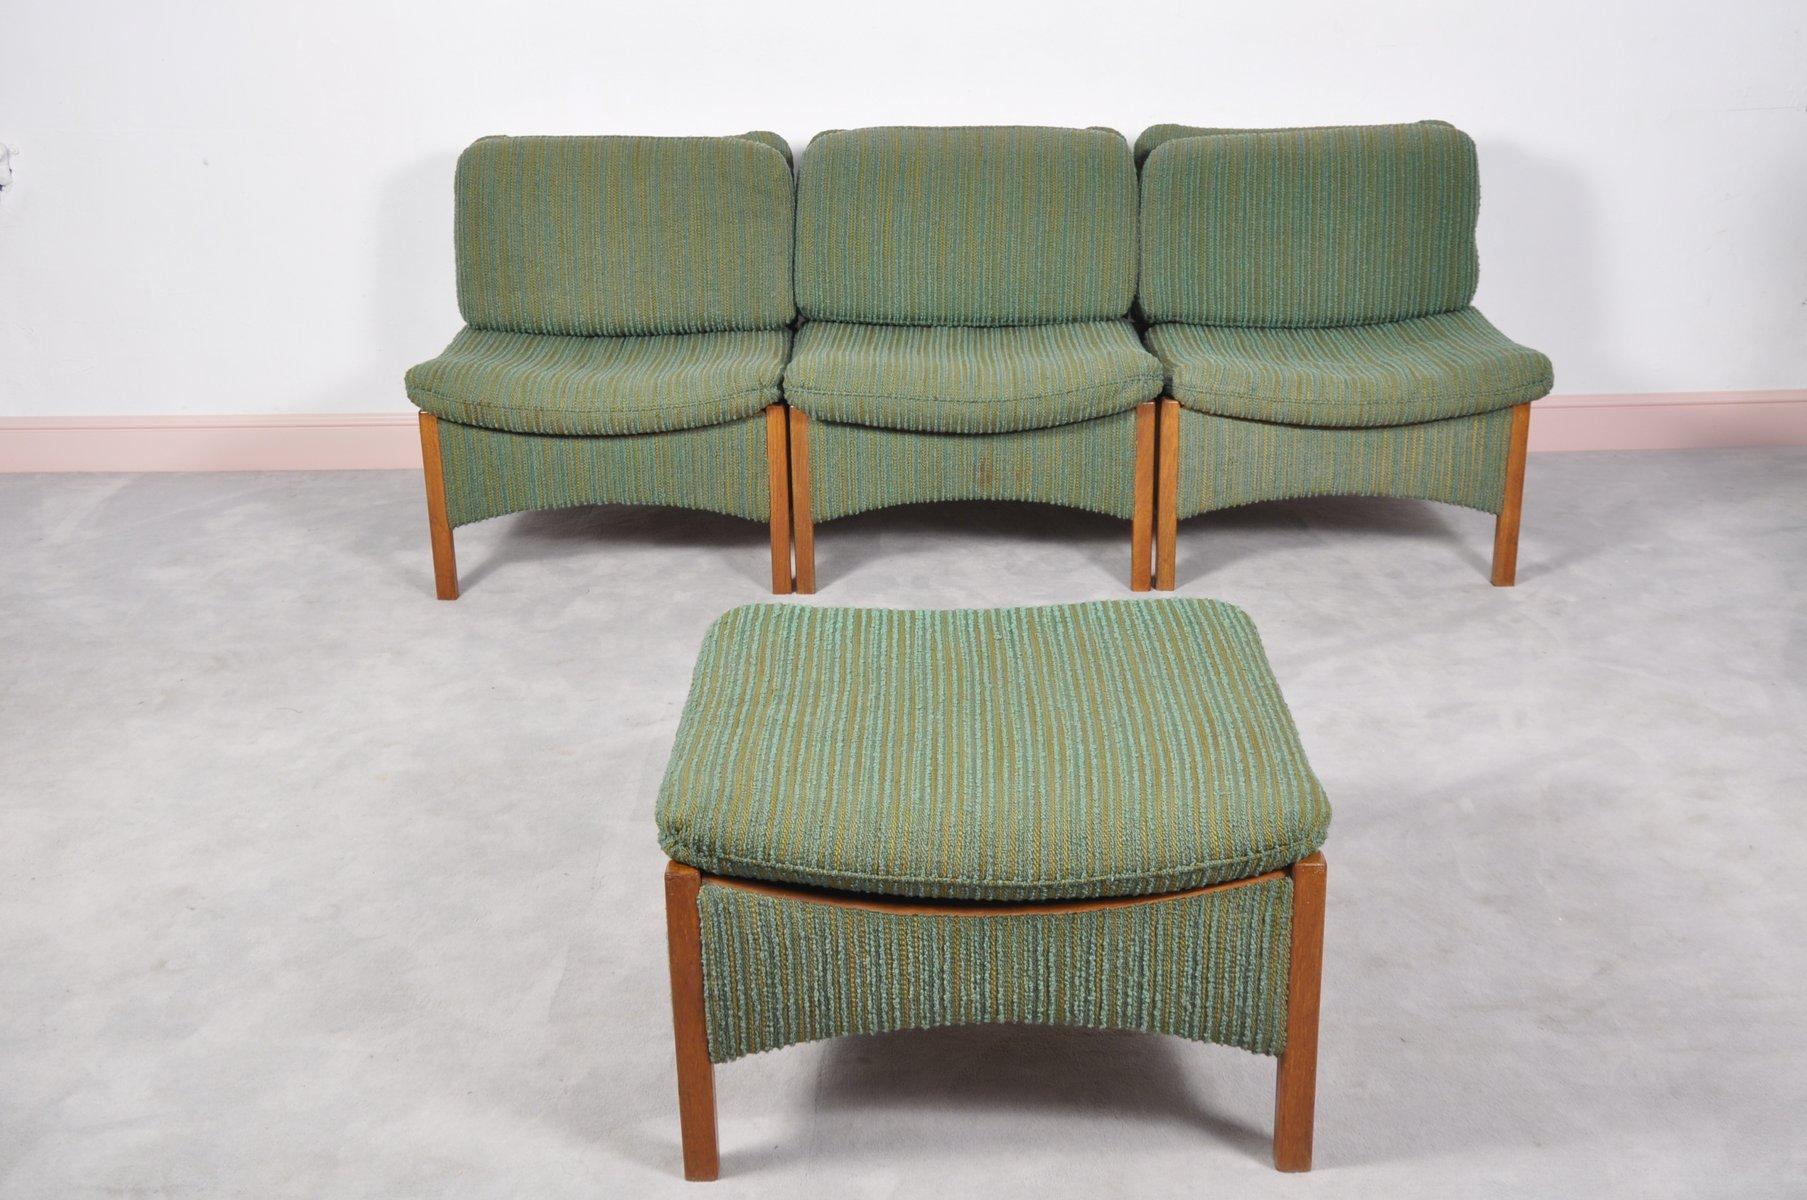 canap mid century sectional en teck danemark en vente. Black Bedroom Furniture Sets. Home Design Ideas